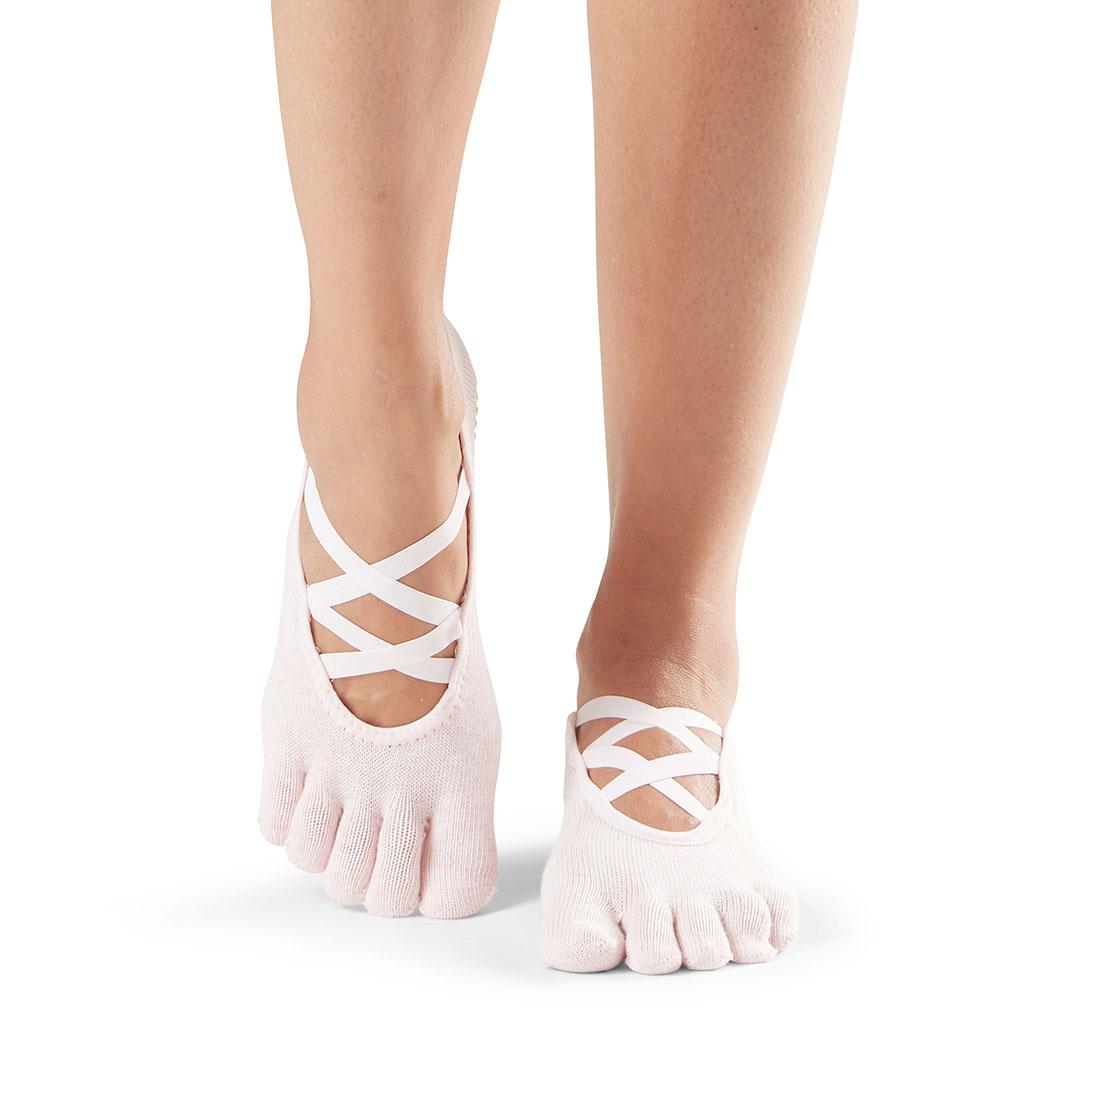 Yogasocken ToeSox Elle Full Toe Pink - 1